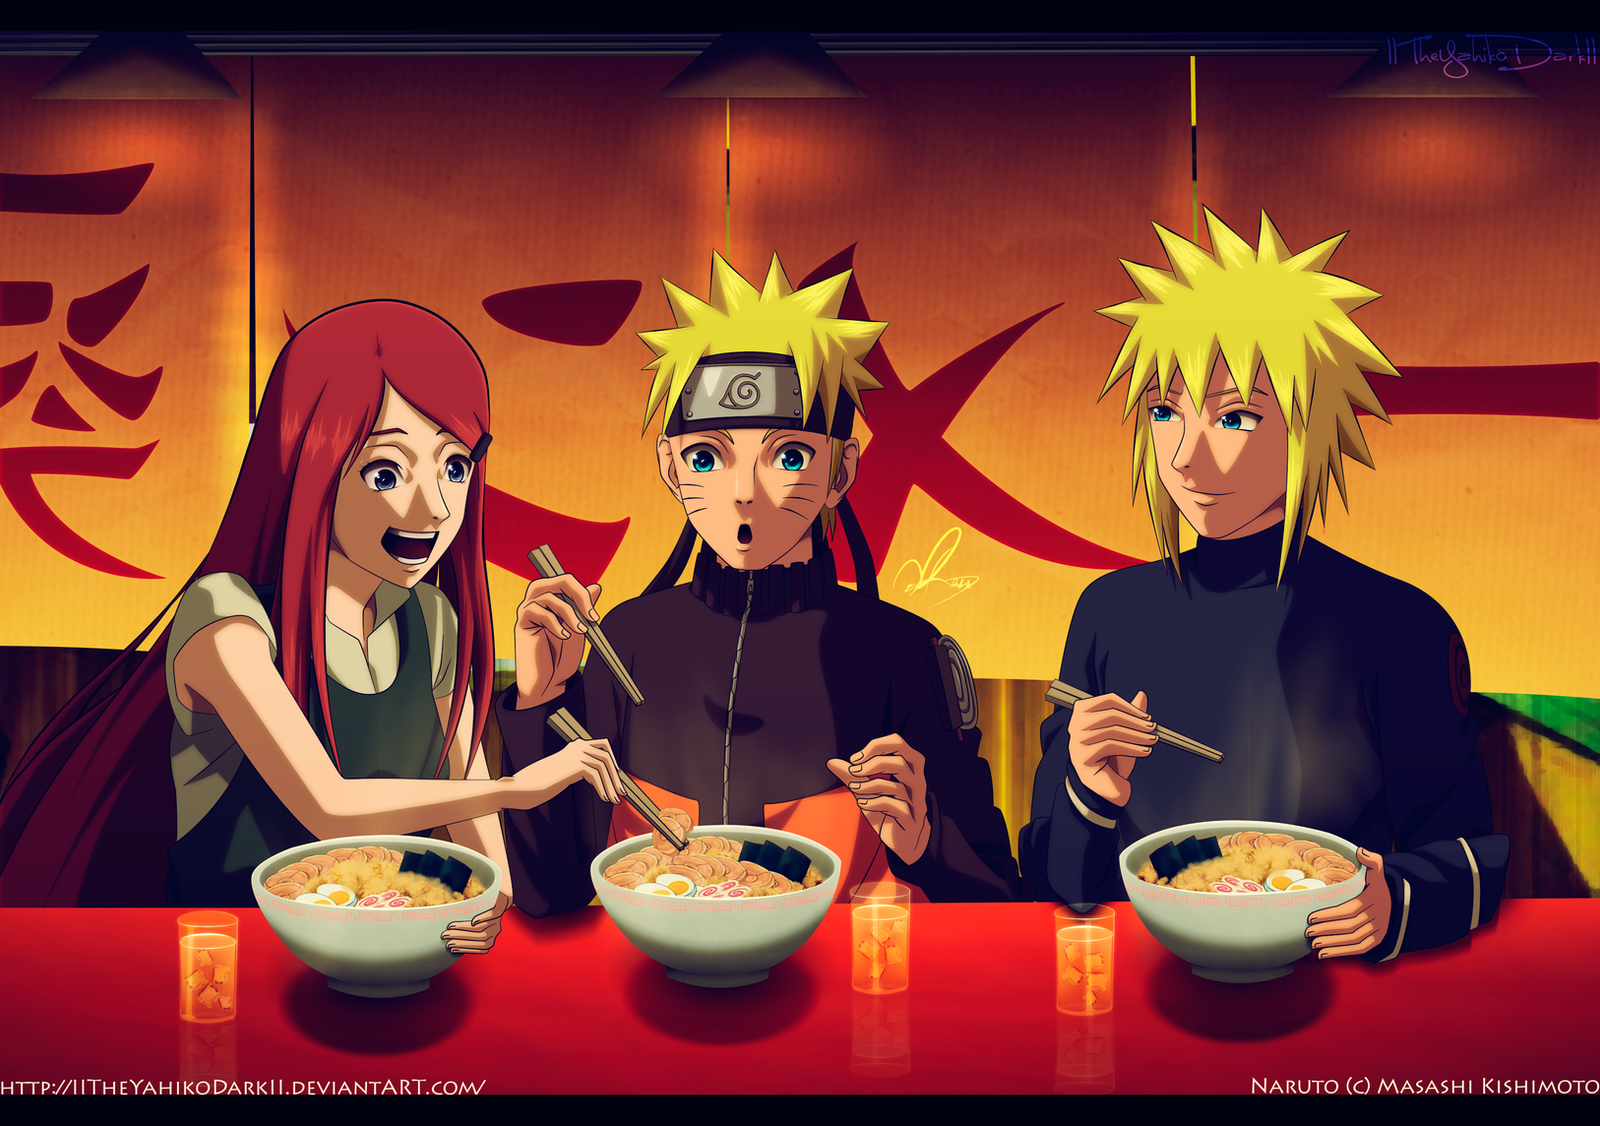 Happy Birthday Uzumaki Naruto 10-10-2013 by IITheYahikoDarkII